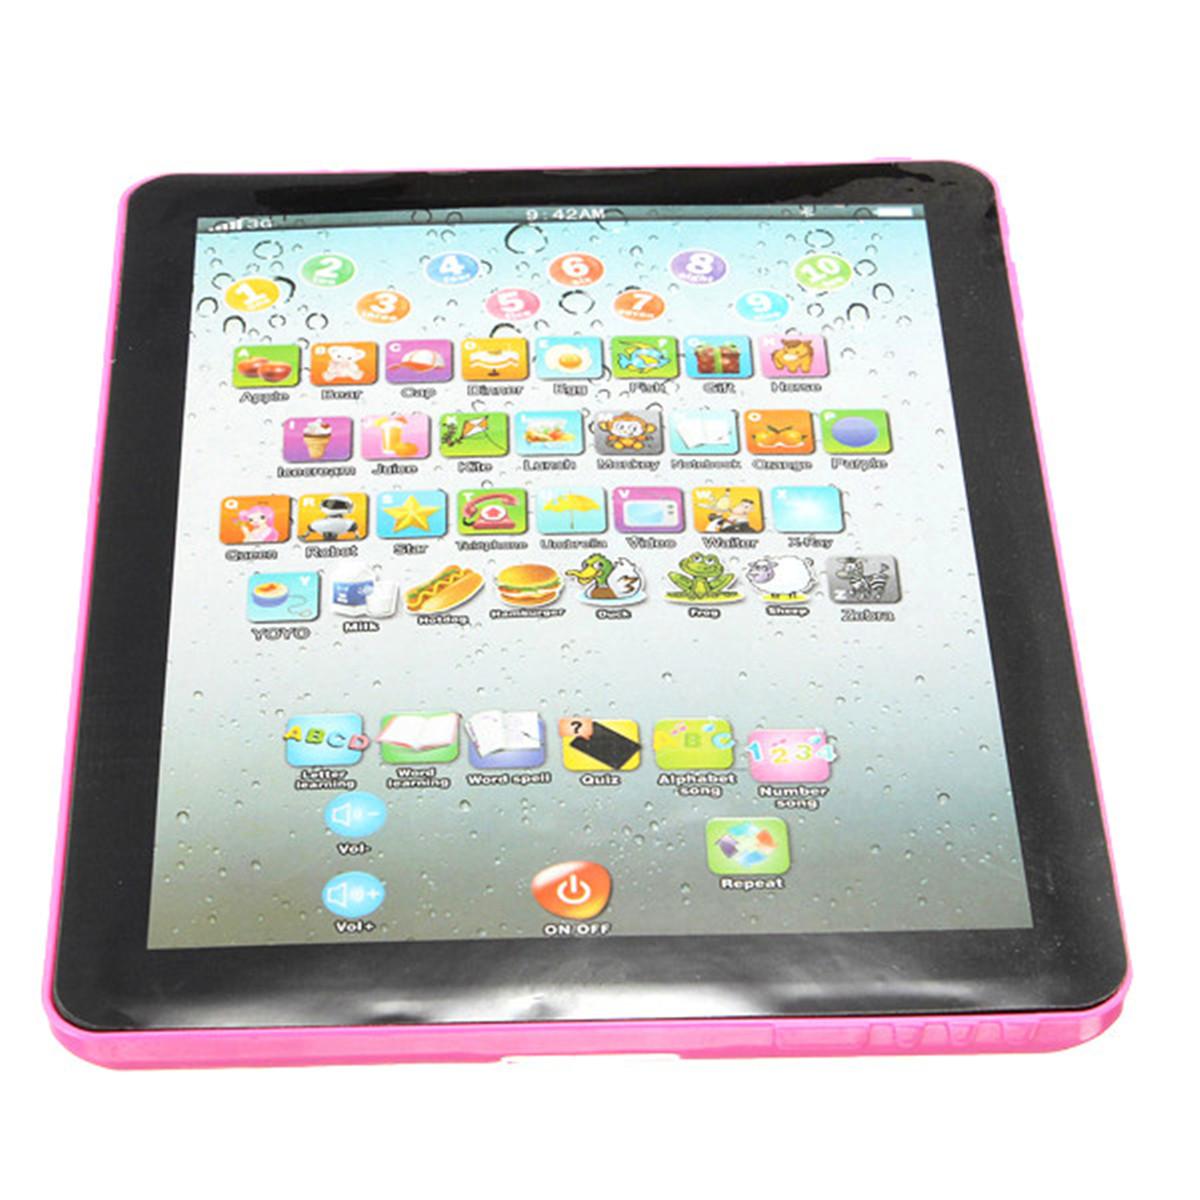 tablette tactile pad enfant bebe jouet educative prononciation compte laptop kid ebay. Black Bedroom Furniture Sets. Home Design Ideas